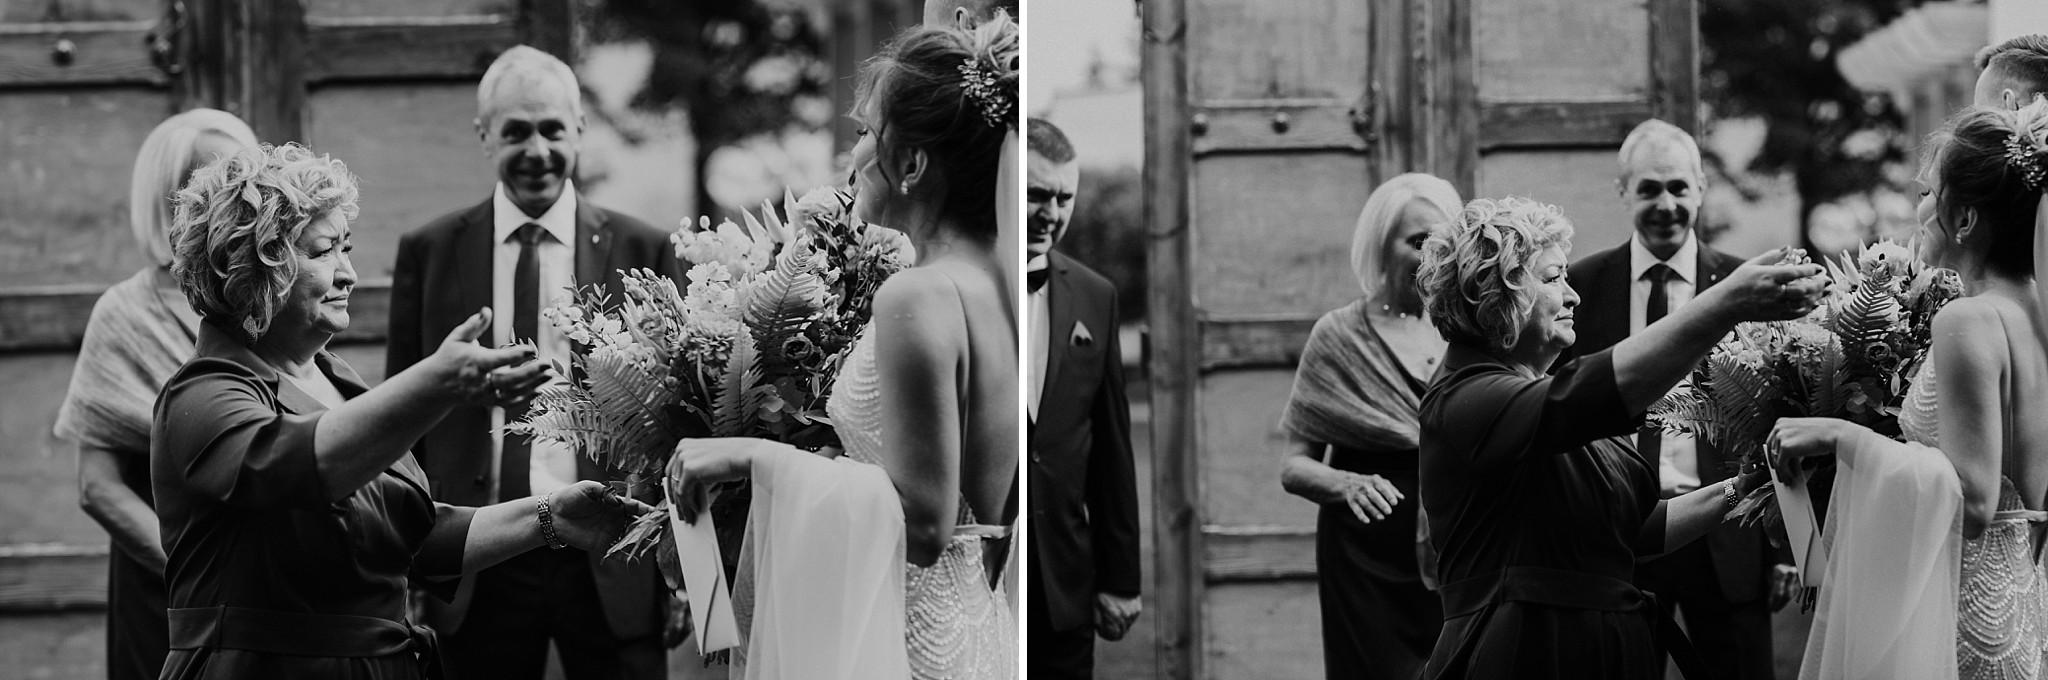 fotograf poznan wesele dobra truskawka piekne wesele pod poznaniem wesele w dobrej truskawce piekna para mloda slub marzen slub koronawirus slub listopad wesele koronawirus 096